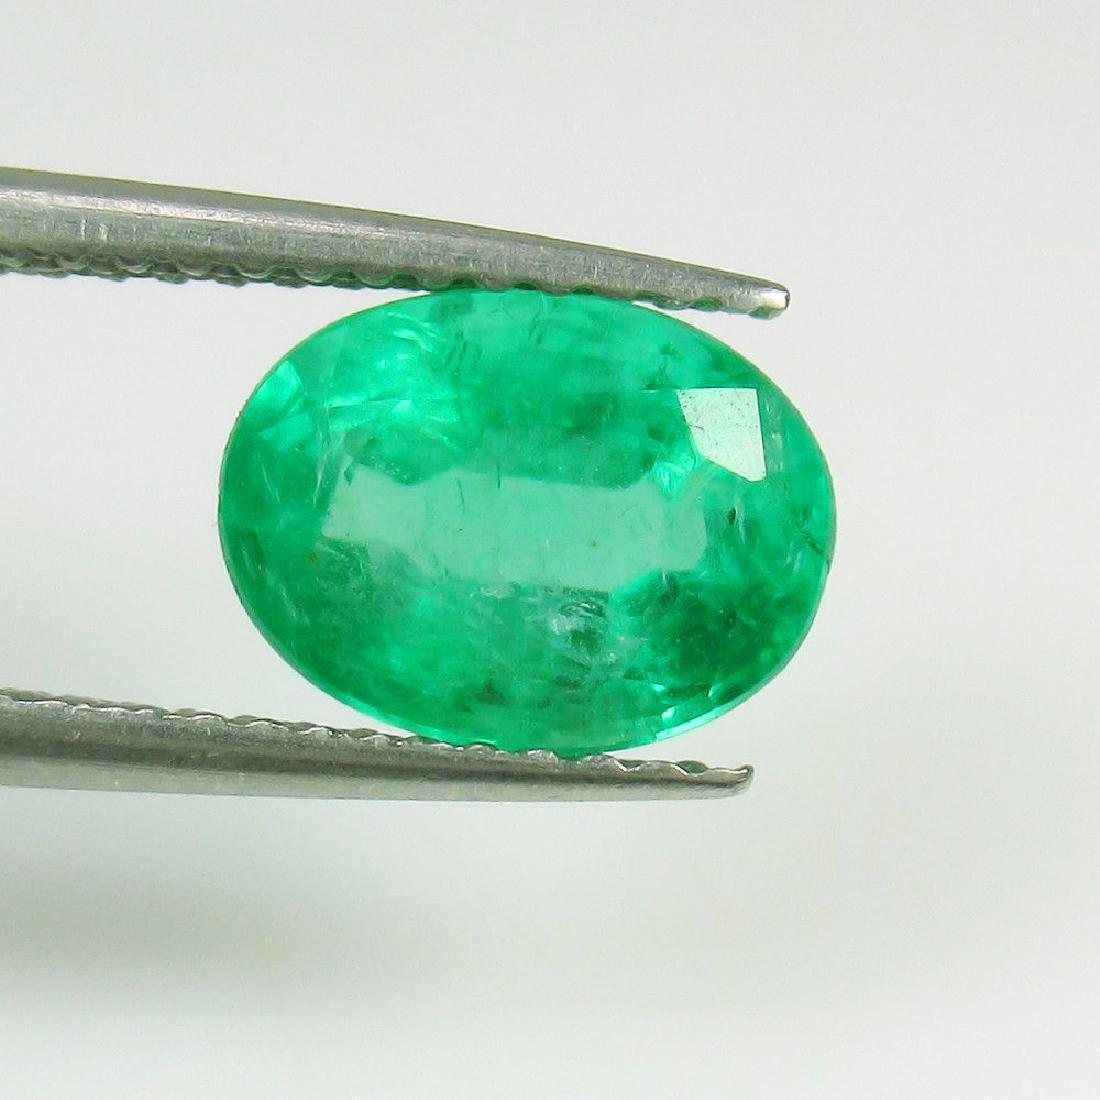 1.73 Ct Genuine Loose Zambian Emerald Nice Oval cut Top - 2